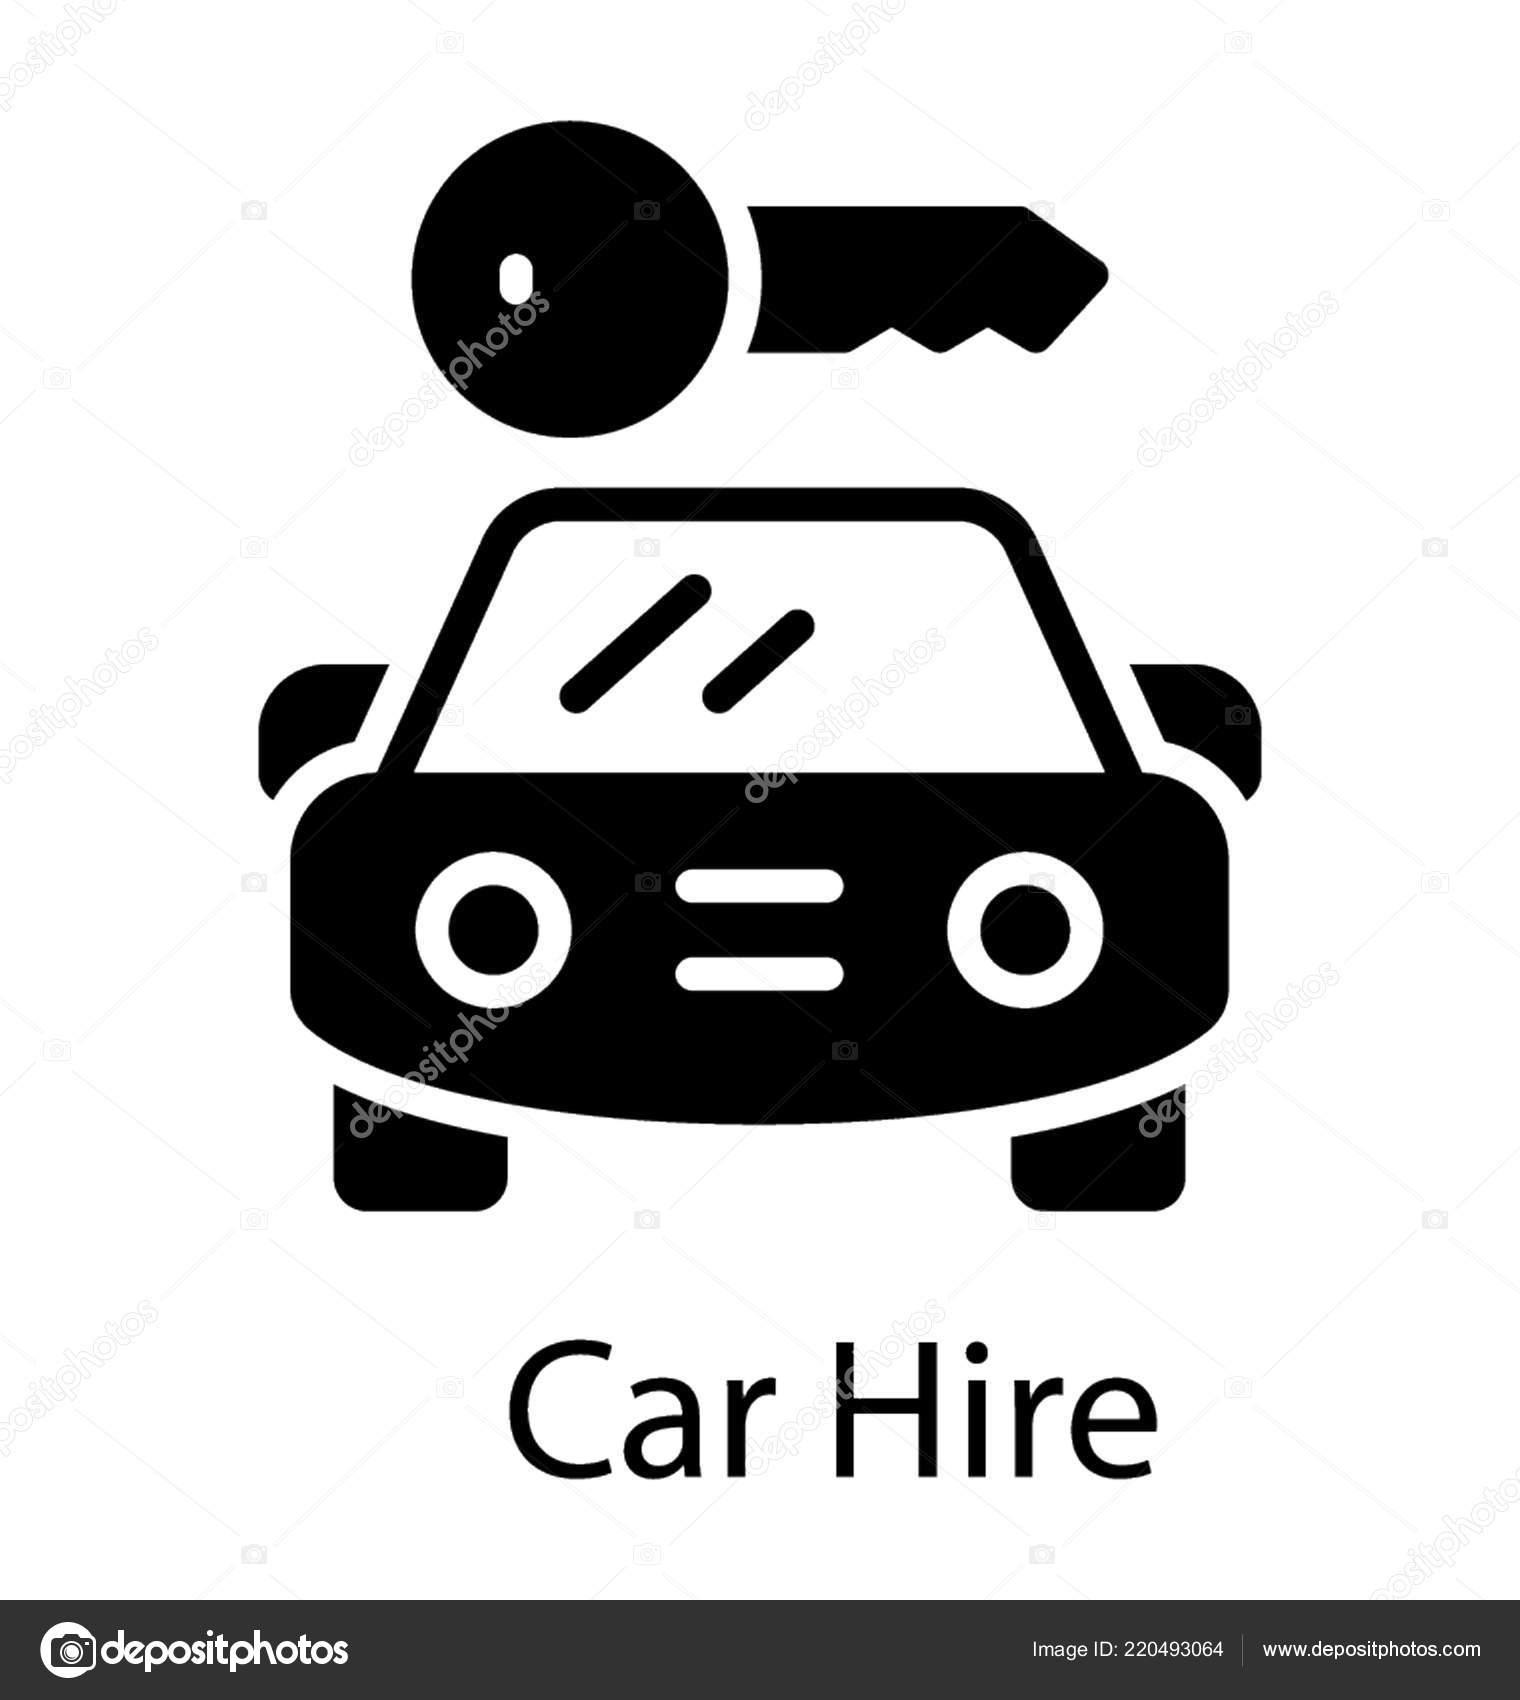 Car Hire Car Rental Icon Stock Vector C Prosymbols 220493064